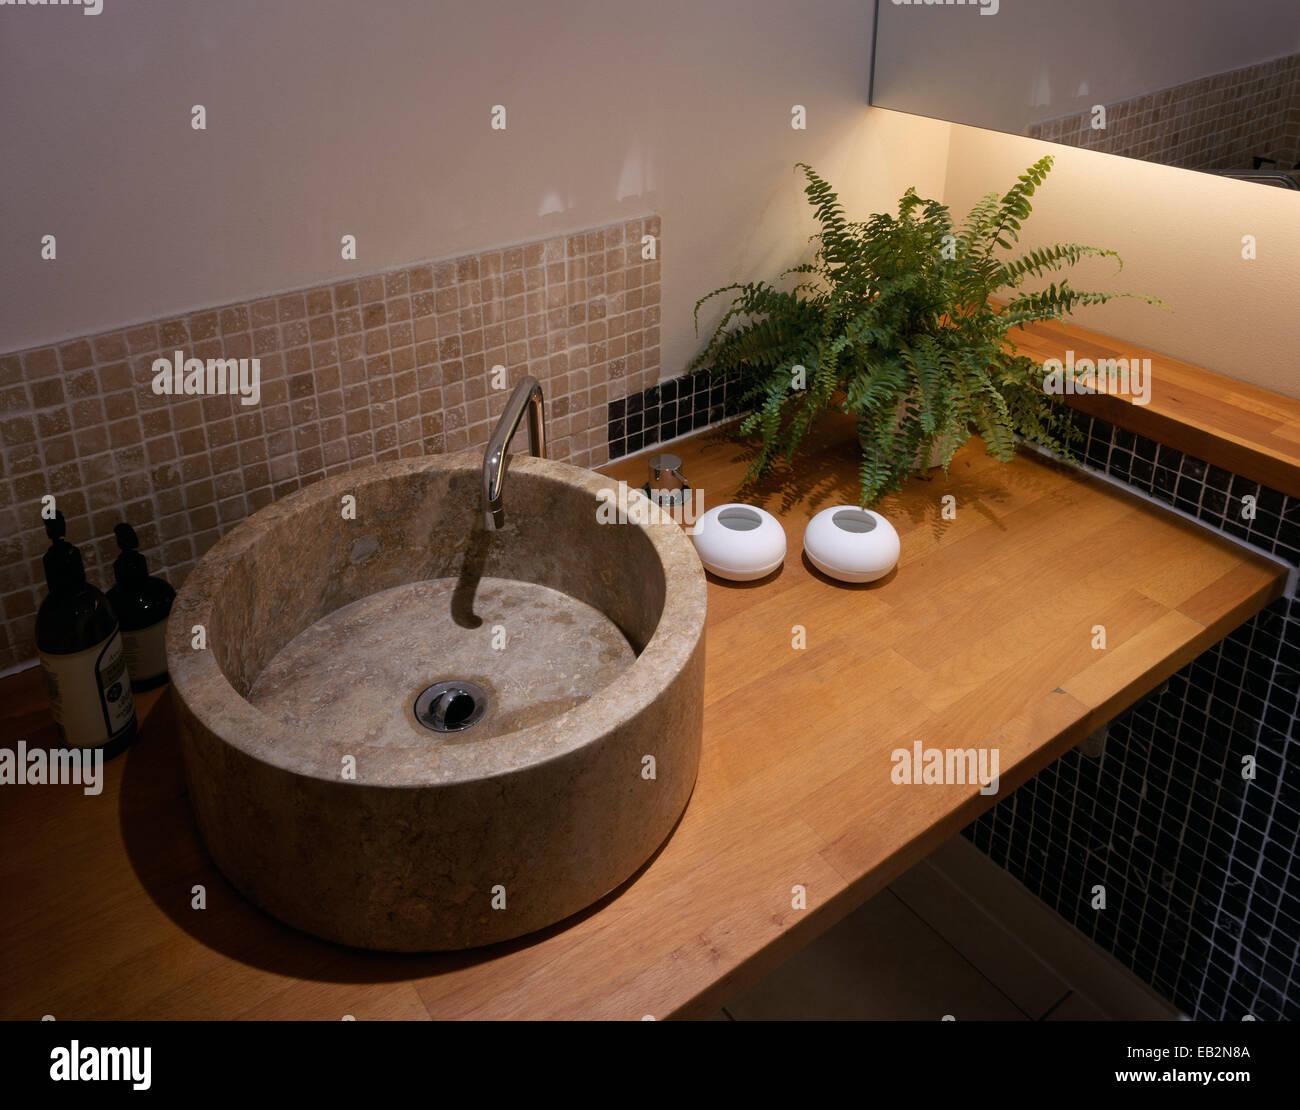 Round stone washbasin in modern bathroom in The Grainstore, Perthshire, Scotland - Stock Image